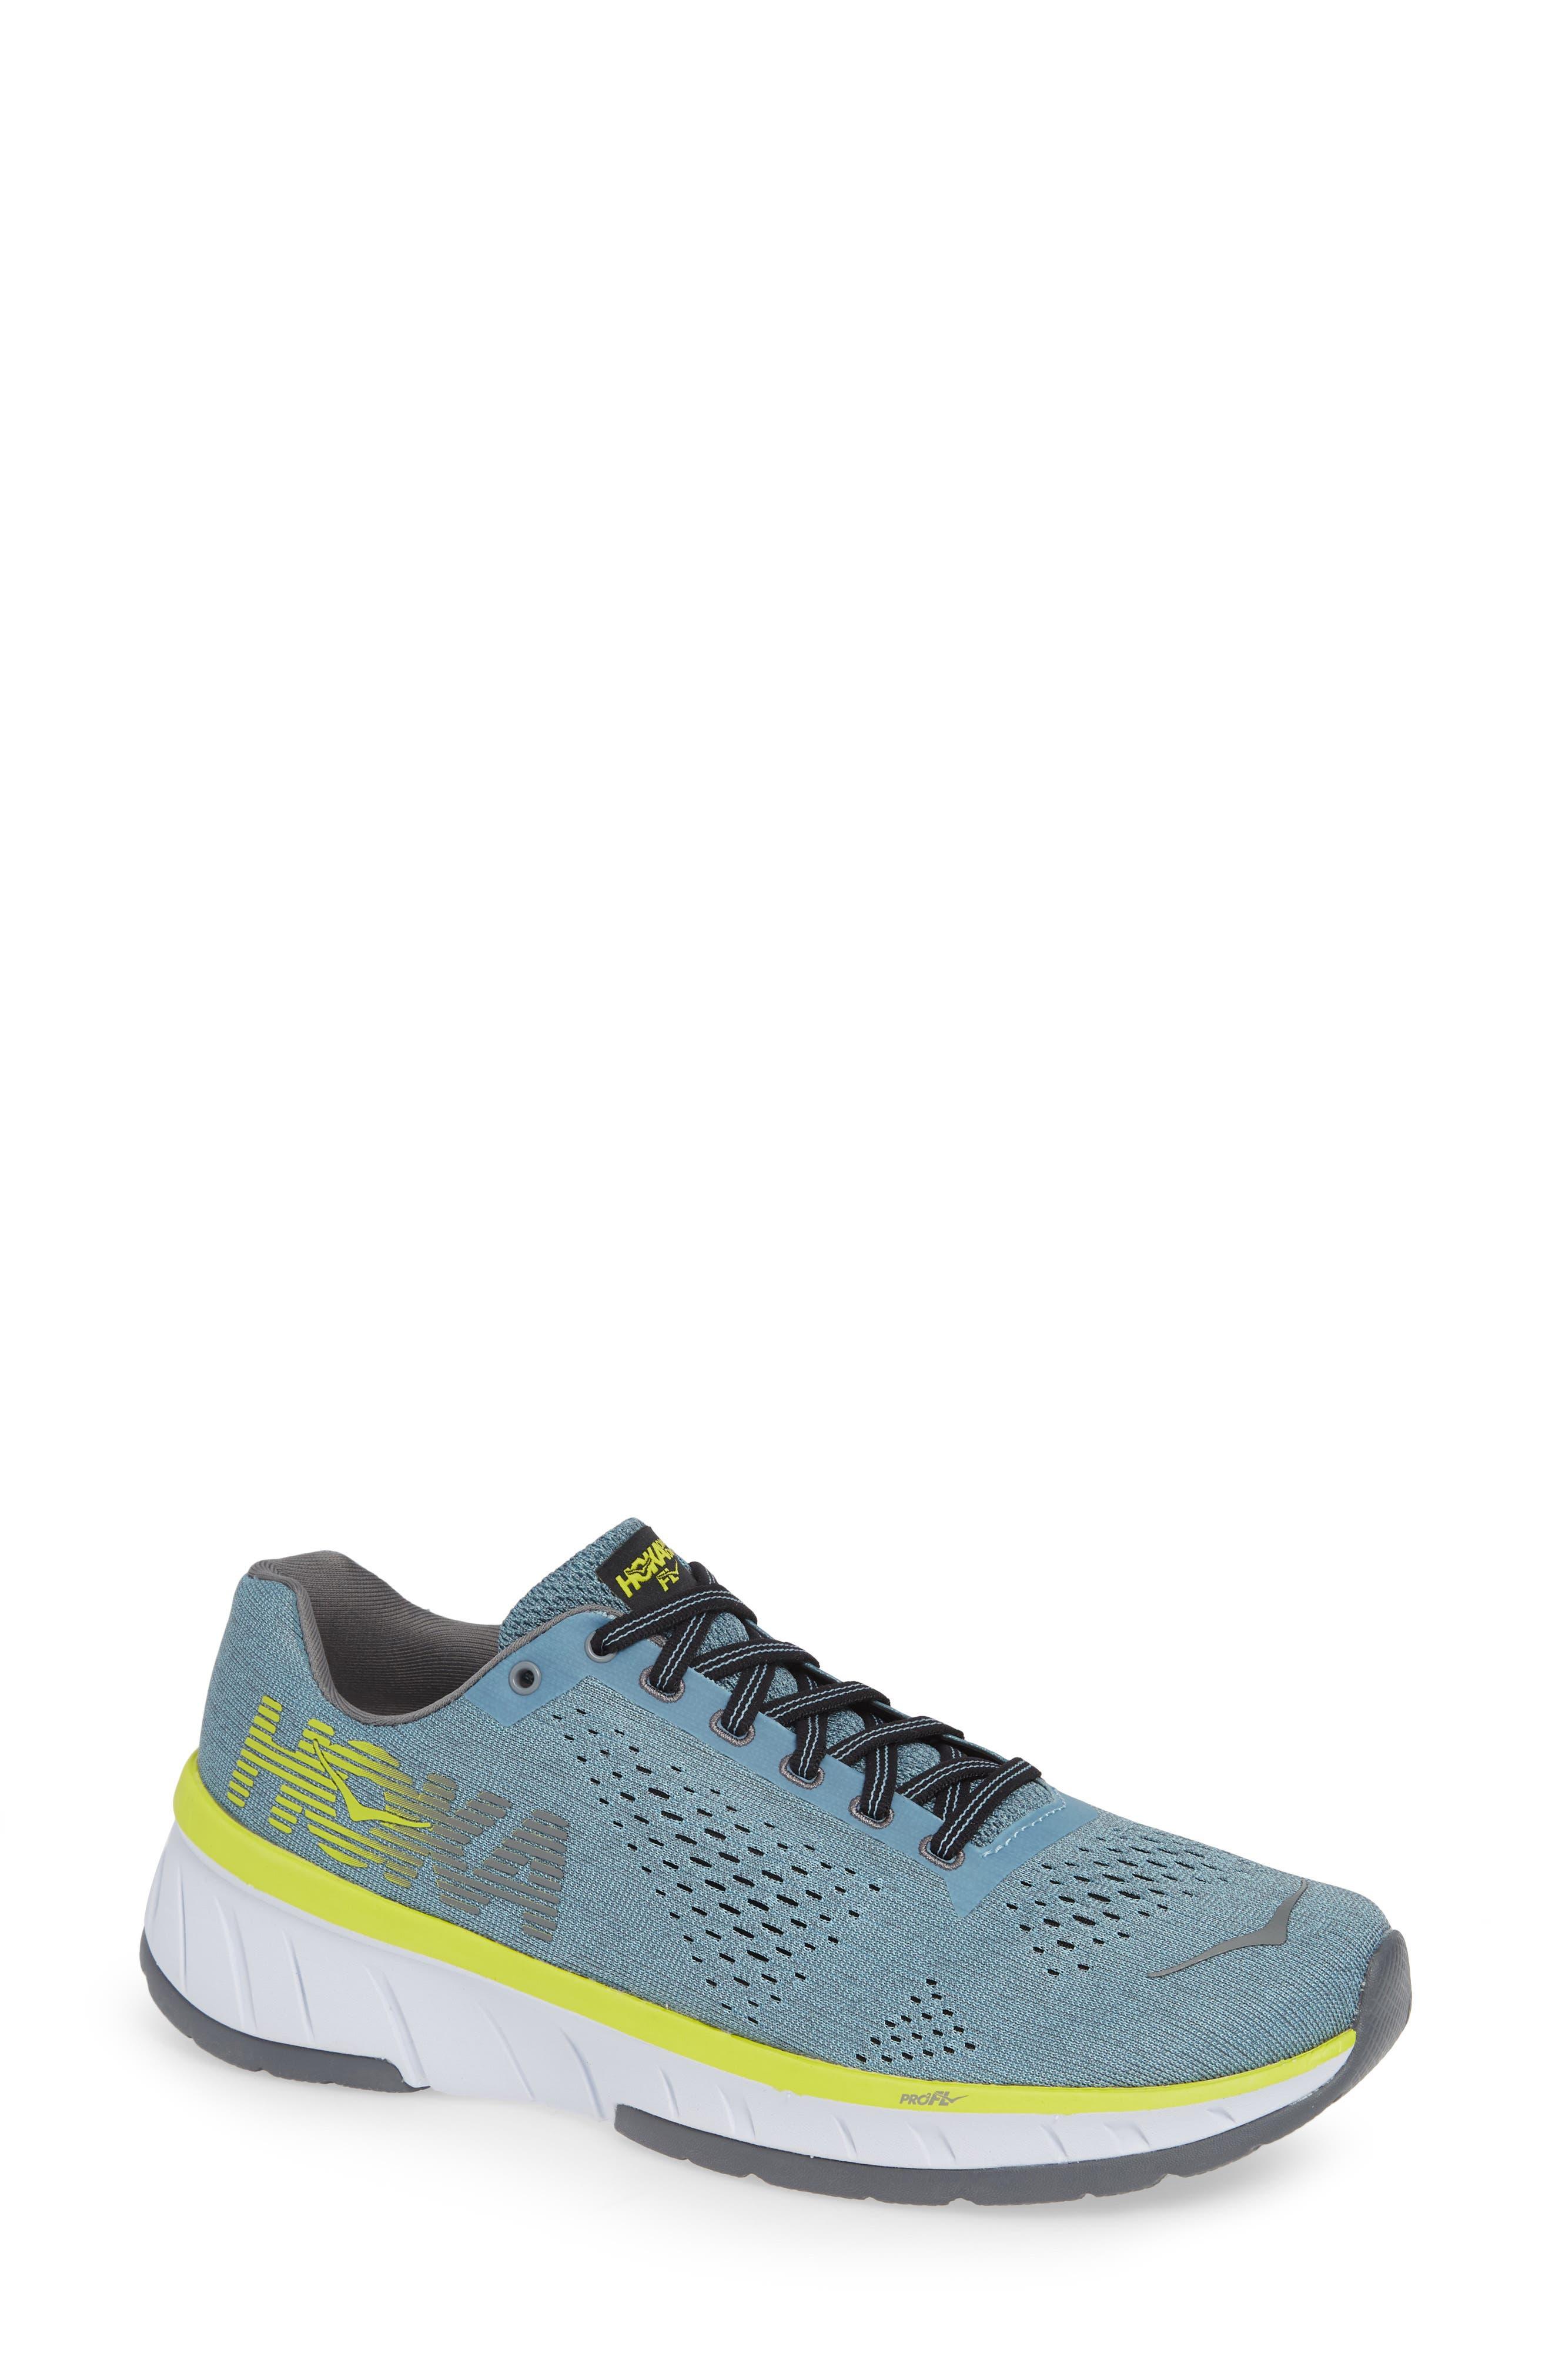 Cavu Running Shoe,                             Main thumbnail 1, color,                             SKY BLUE/ NEUTRAL GREY